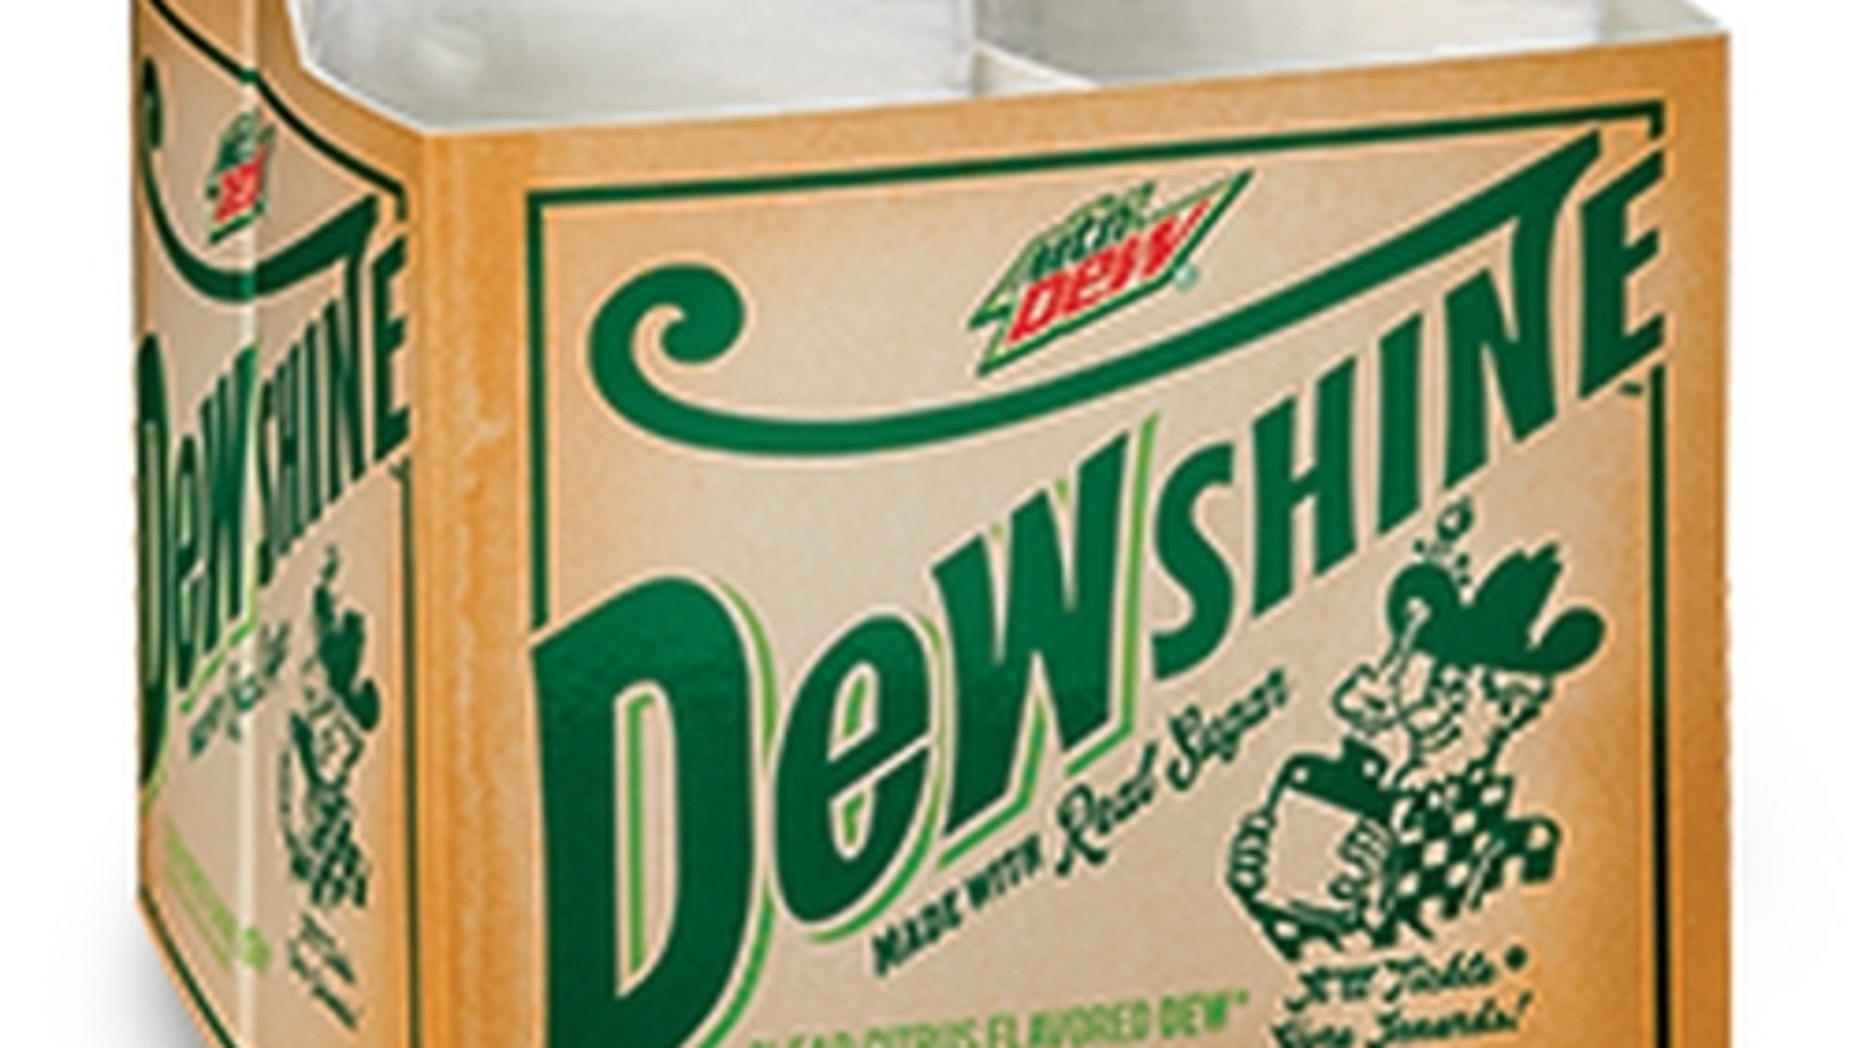 Mountain Dew breaks into the craft soda market.